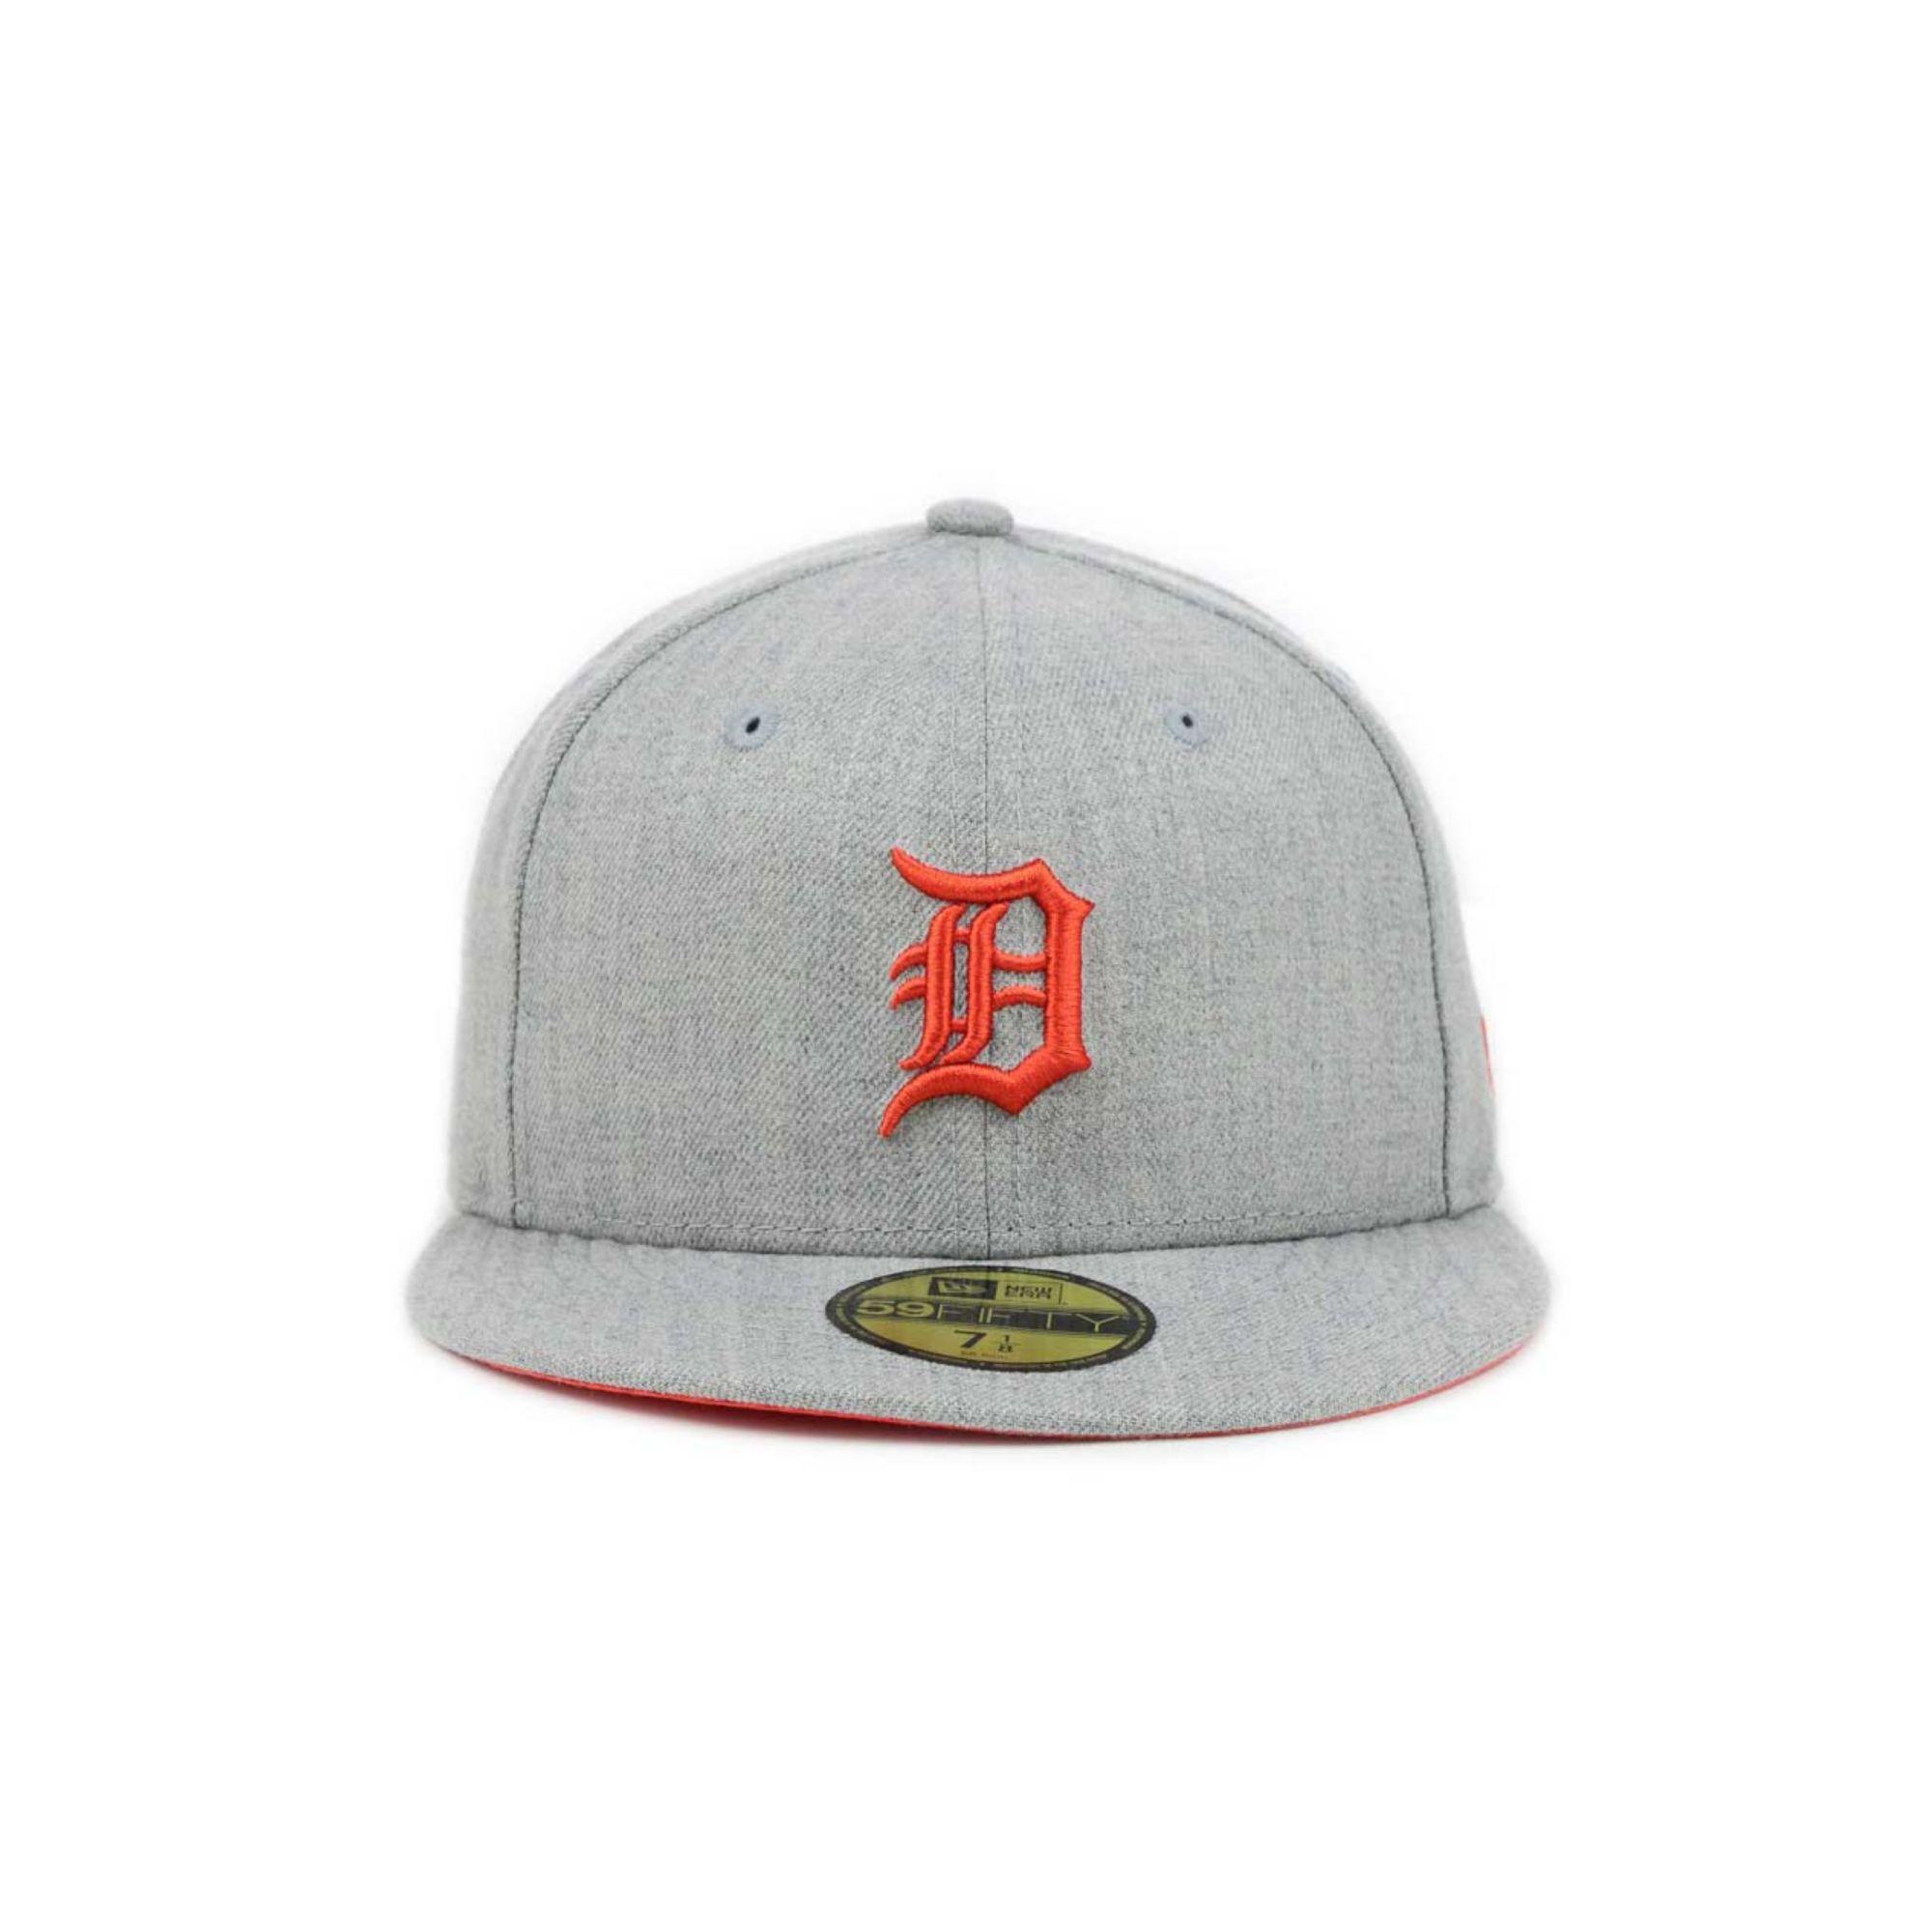 59ad2dd68fe Lyst - KTZ Detroit Tigers Mlb Heather Basic 59fifty Cap in Gray for Men